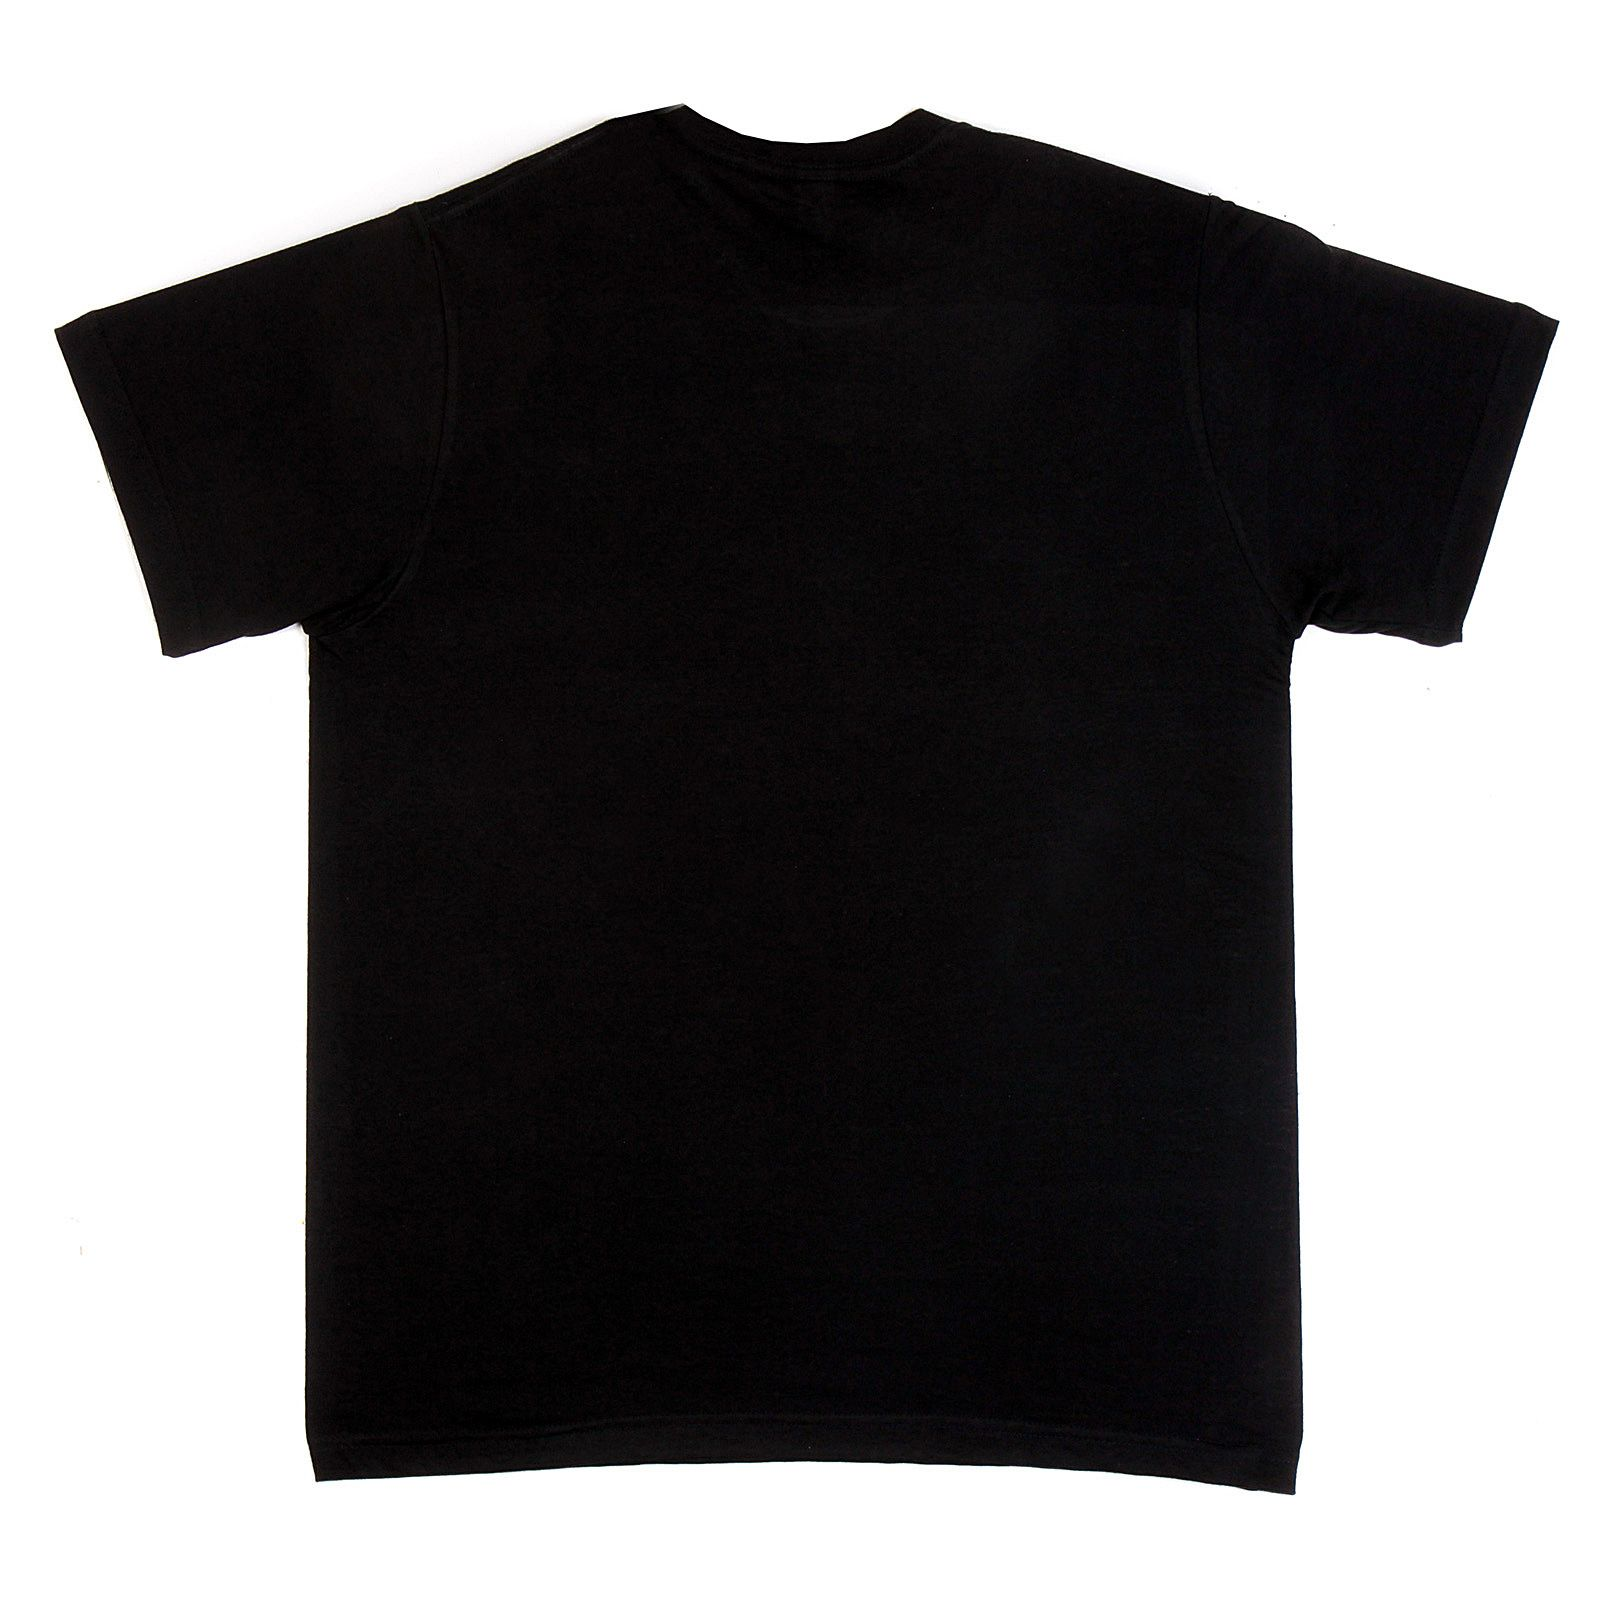 Black t shirt plain front and back - Black Simple Black T Shirt